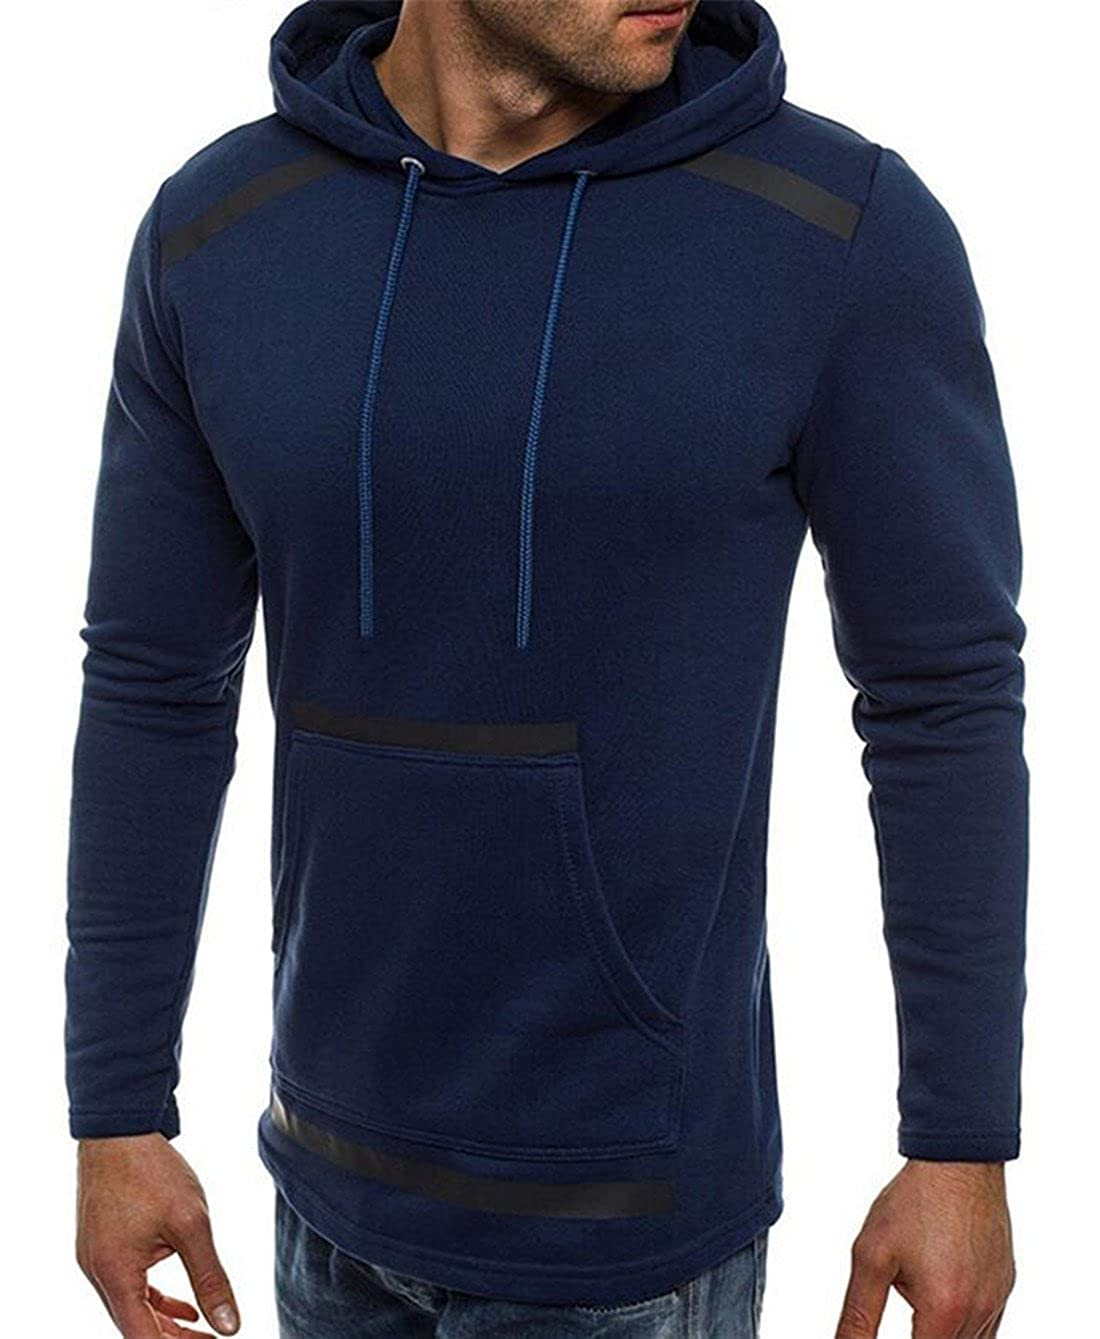 Nanquan Men Casual Patchwork Pockets Front Drawstring Hoodie Slim Fit Sweatshirt